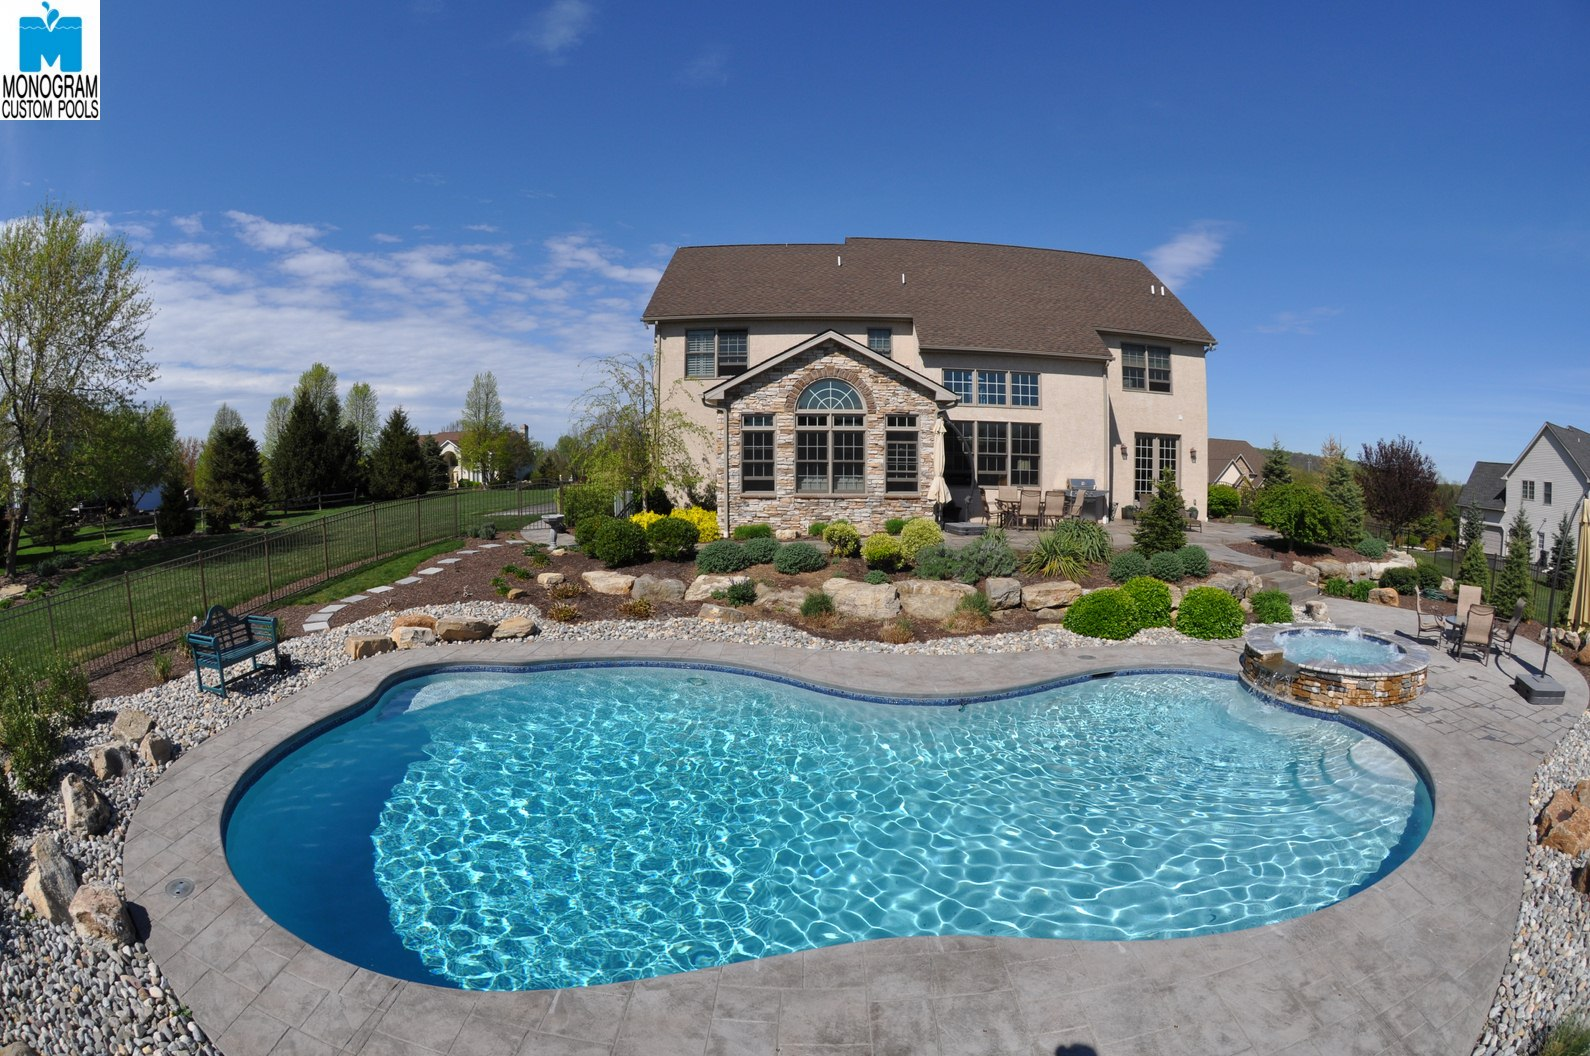 Monogram custom homes and pools selected as lehigh valley for Salt water pool